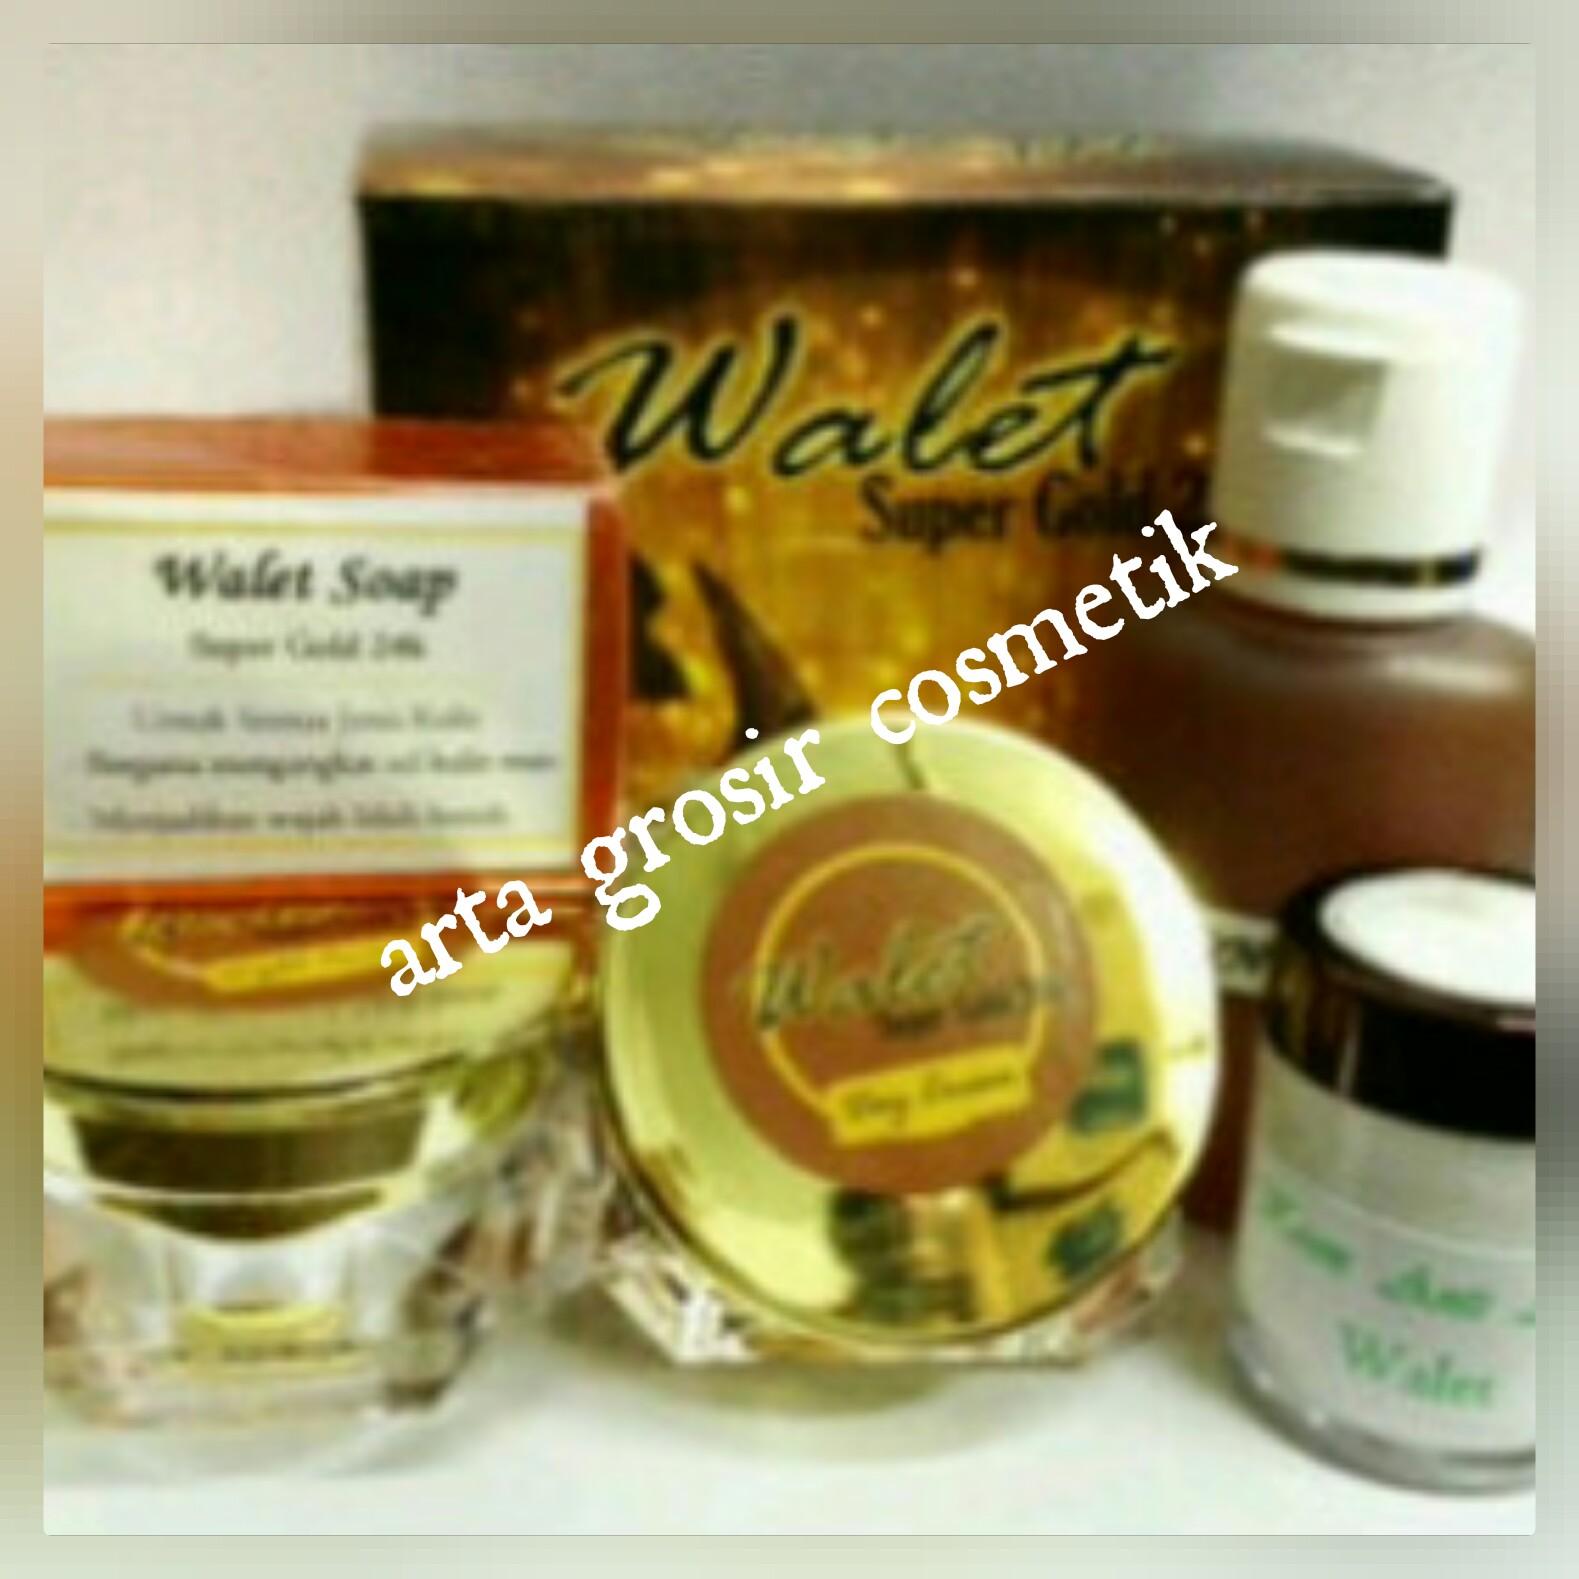 Jual Cream Walet Super Gold 24k Arta Grosir Tokopedia